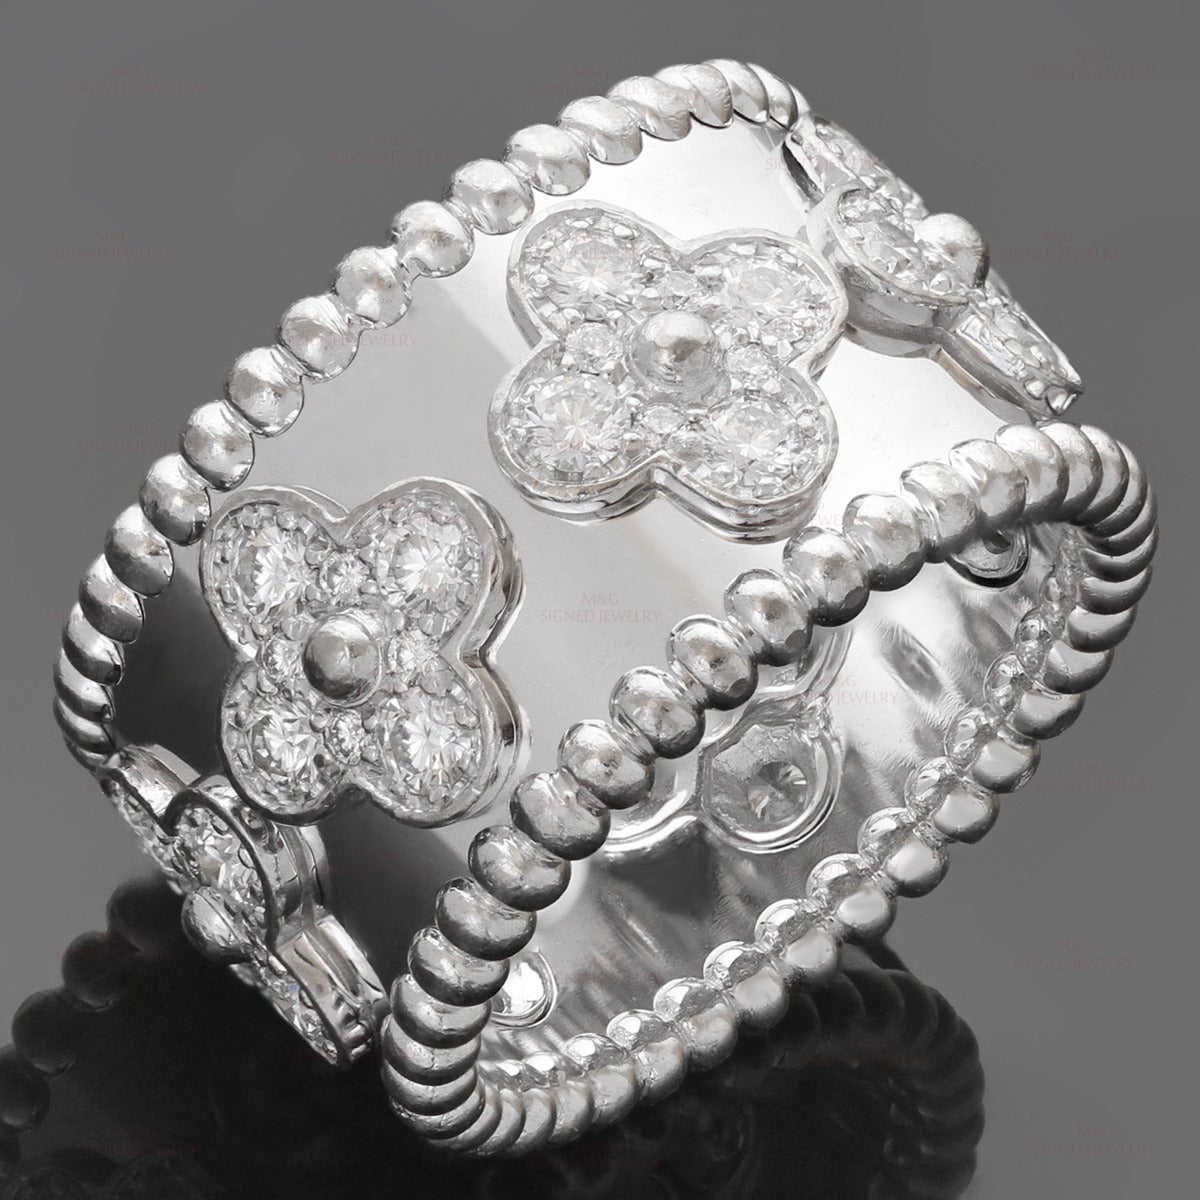 Van Cleef & Arpels Perlee Clover Diamond Gold Band Ring 6